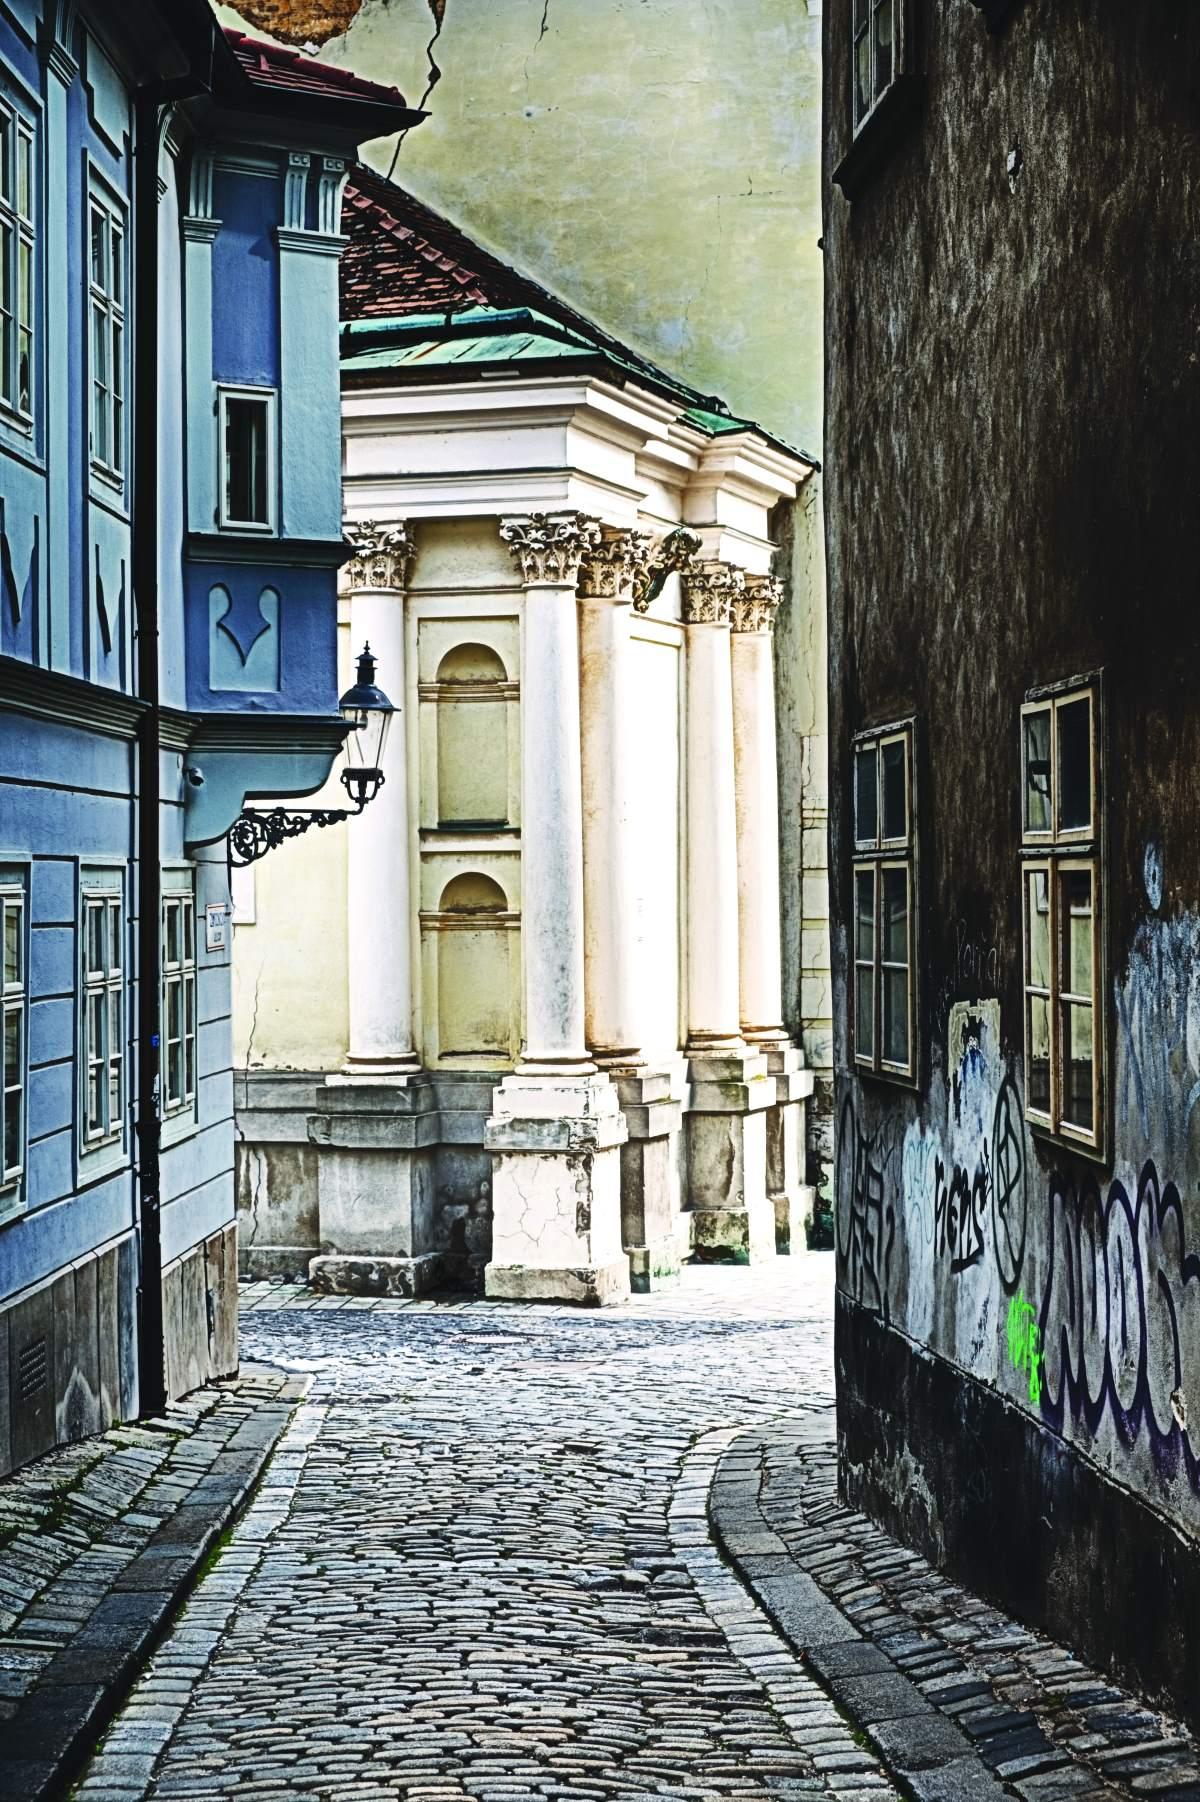 Aτμοσφαιρικό πλακόστρωτο σοκάκι στην Παλιά Πόλη της Μπρατισλάβα